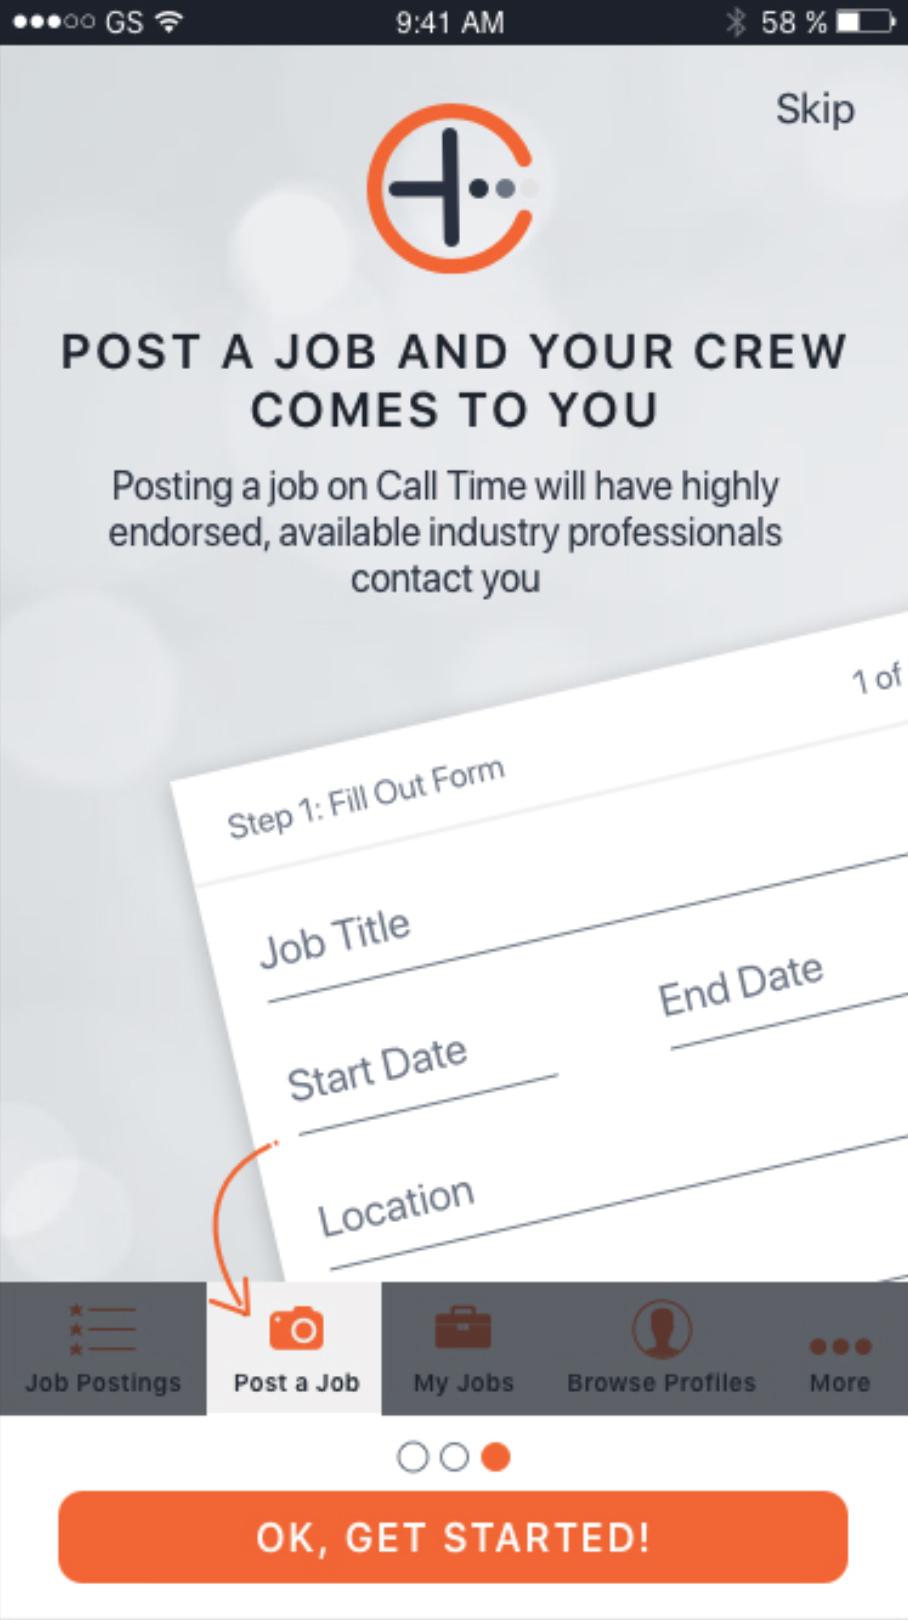 App Screenshot: Posting A Job